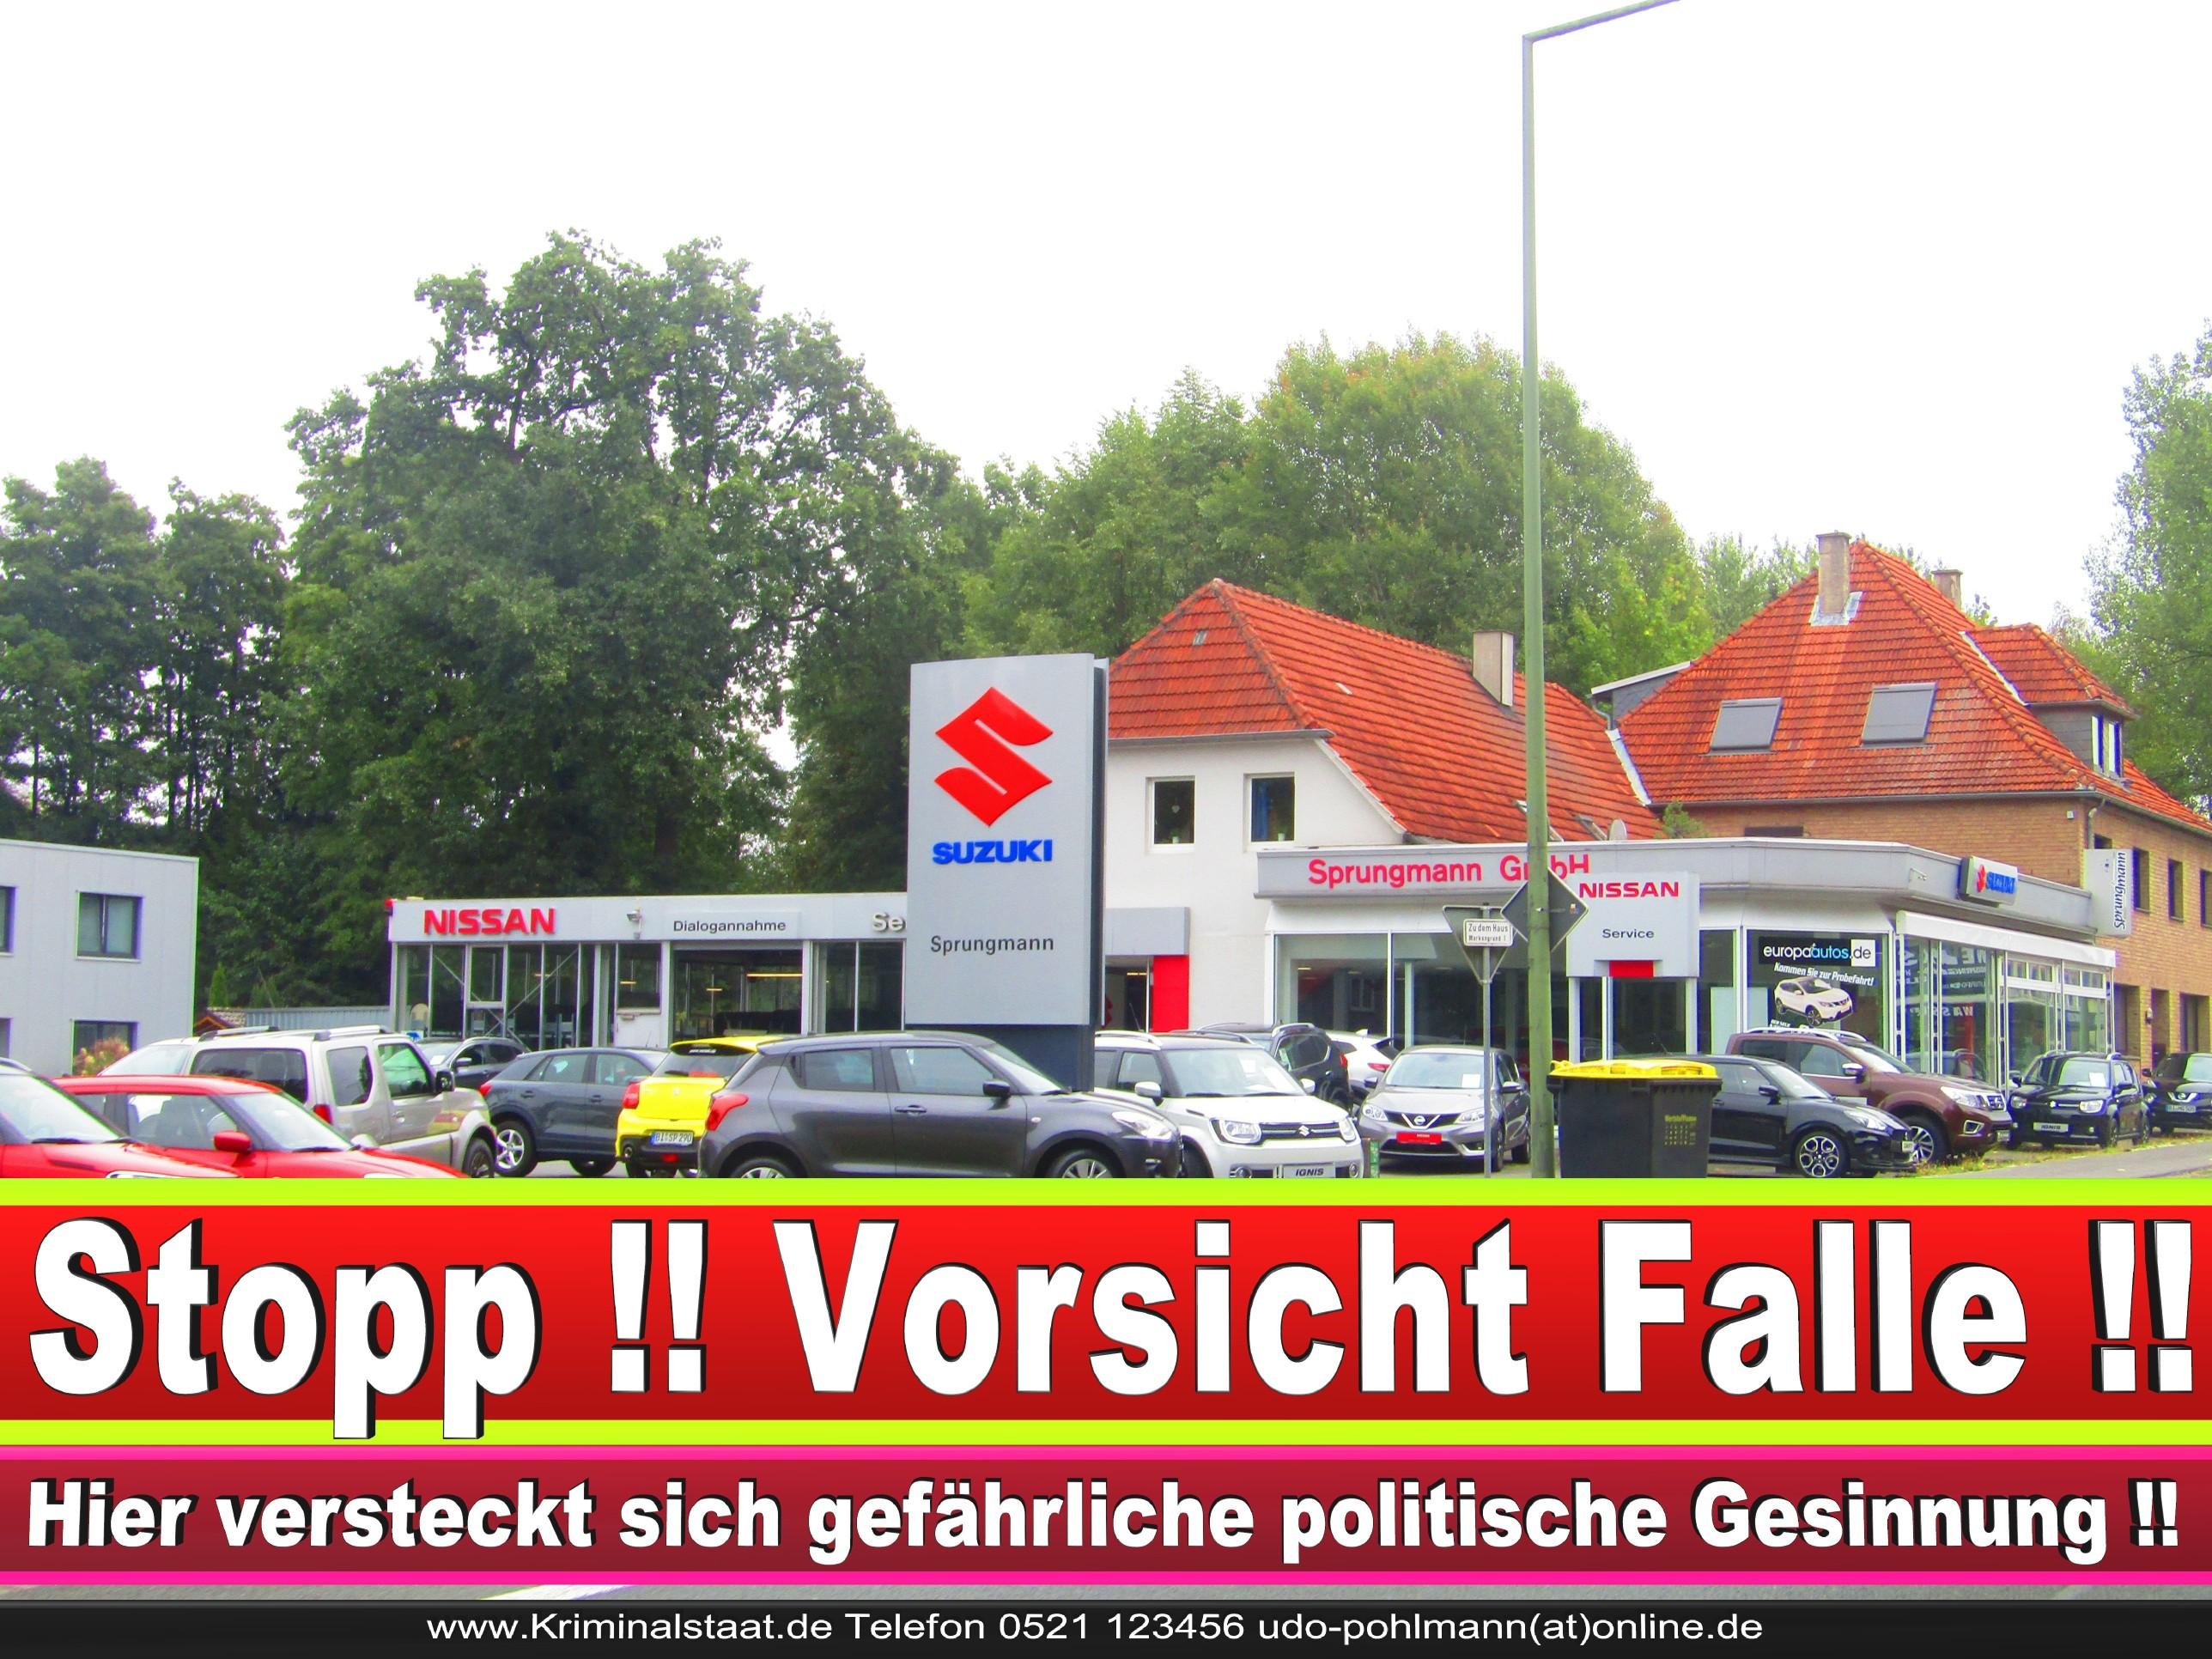 AUTOHAUS SPRUNGMANN CDU BIELEFELD 2 LANDTAGSWAHL BUNDESTAGSWAHL BÜRGERMEISTERWAHL